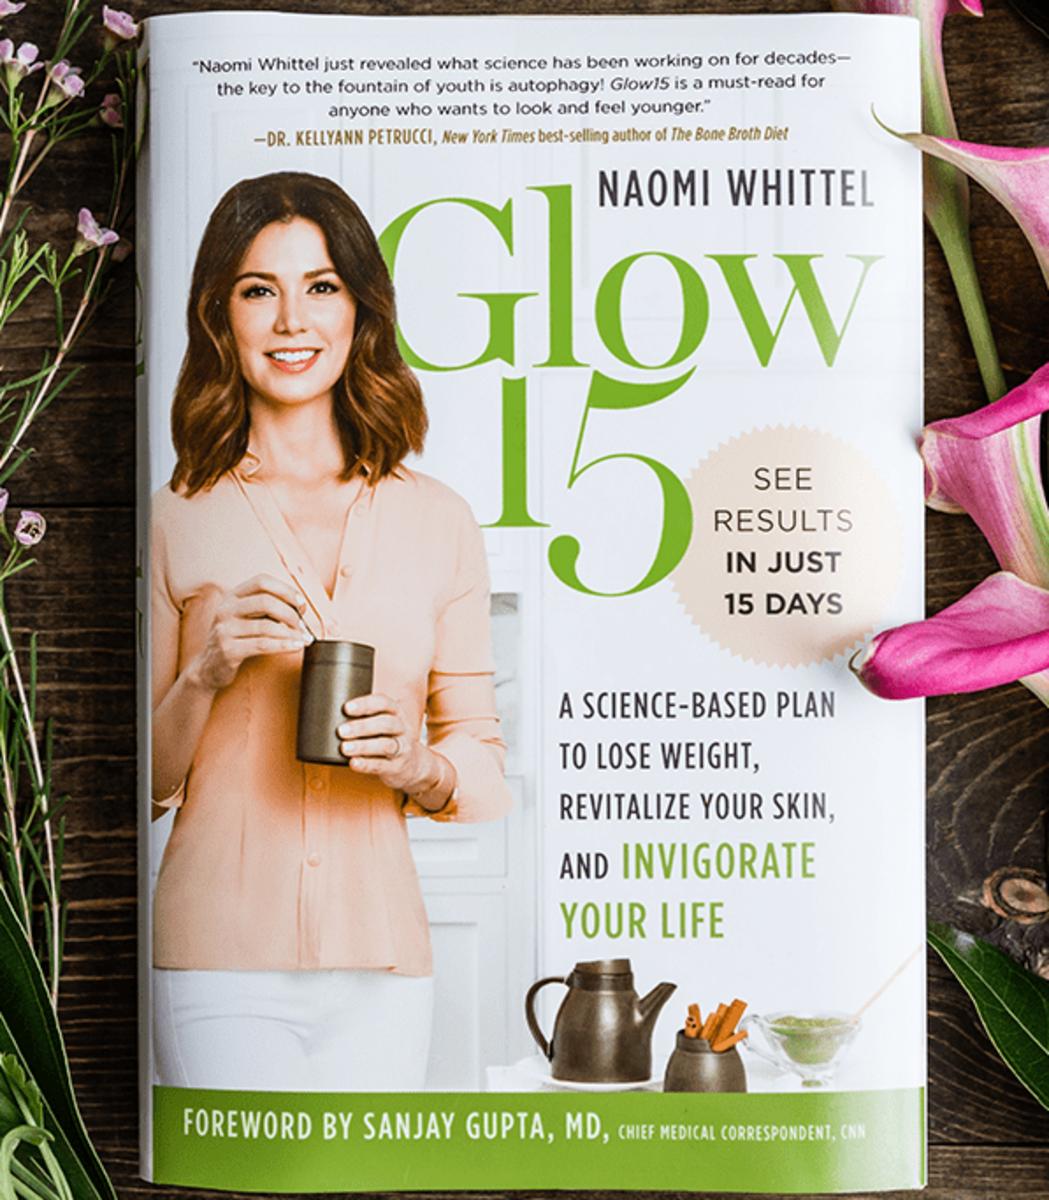 Glow-15-Book-Cover-Mockups-25-e1526348667306